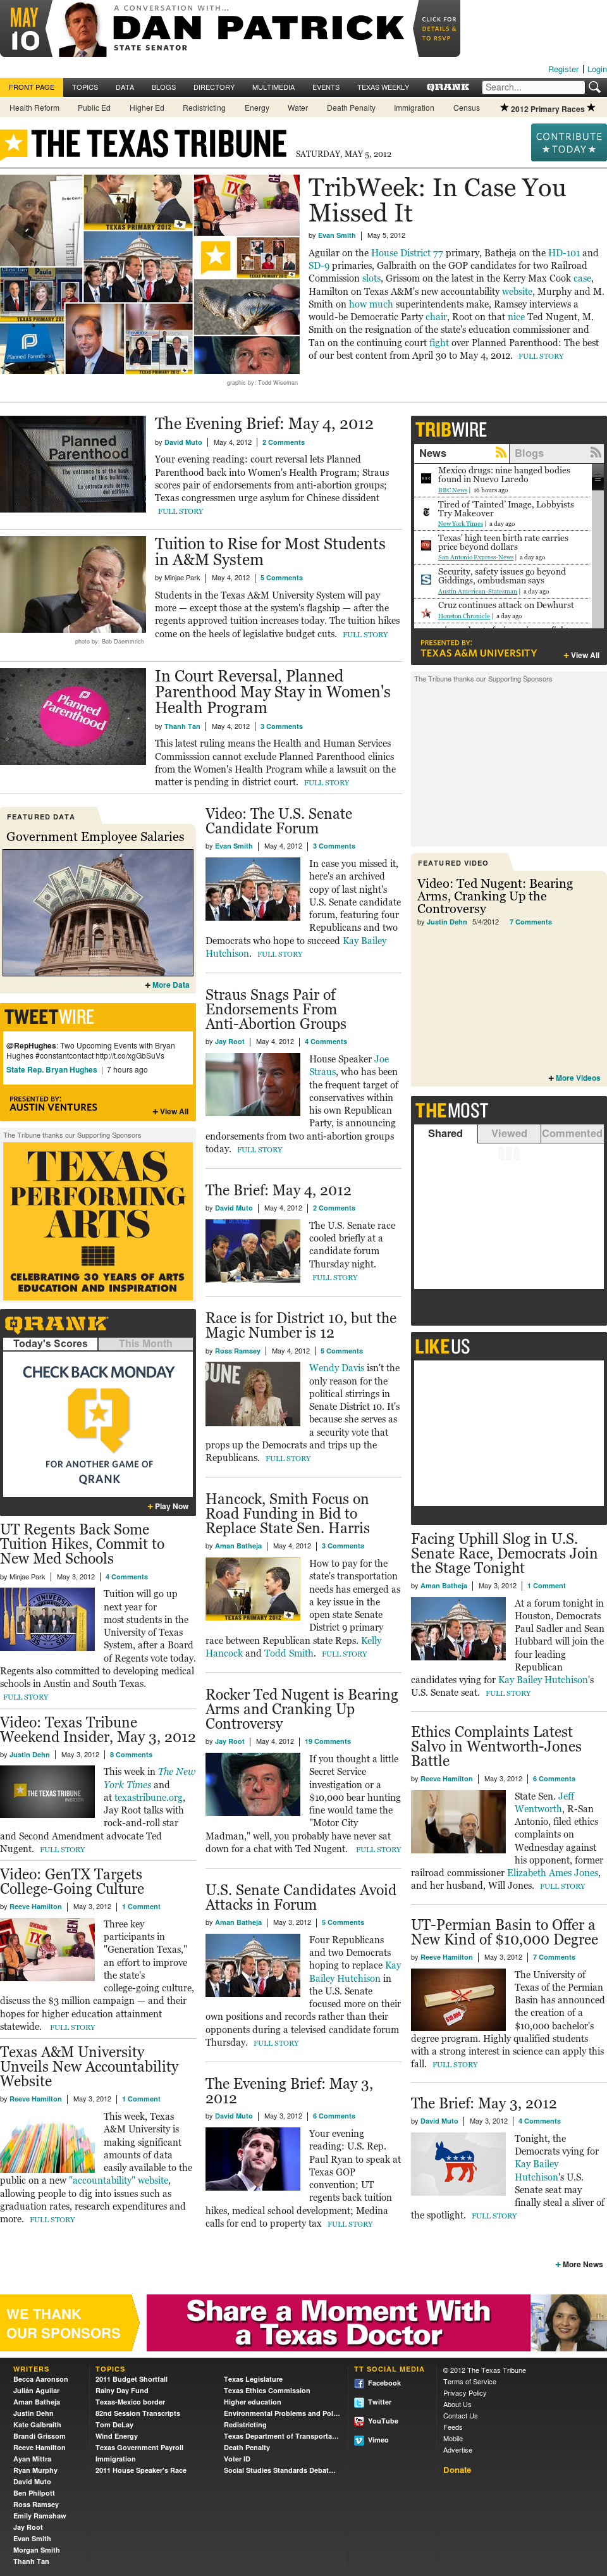 The Texas Tribune at Saturday May 5, 2012, 11:13 a.m. UTC